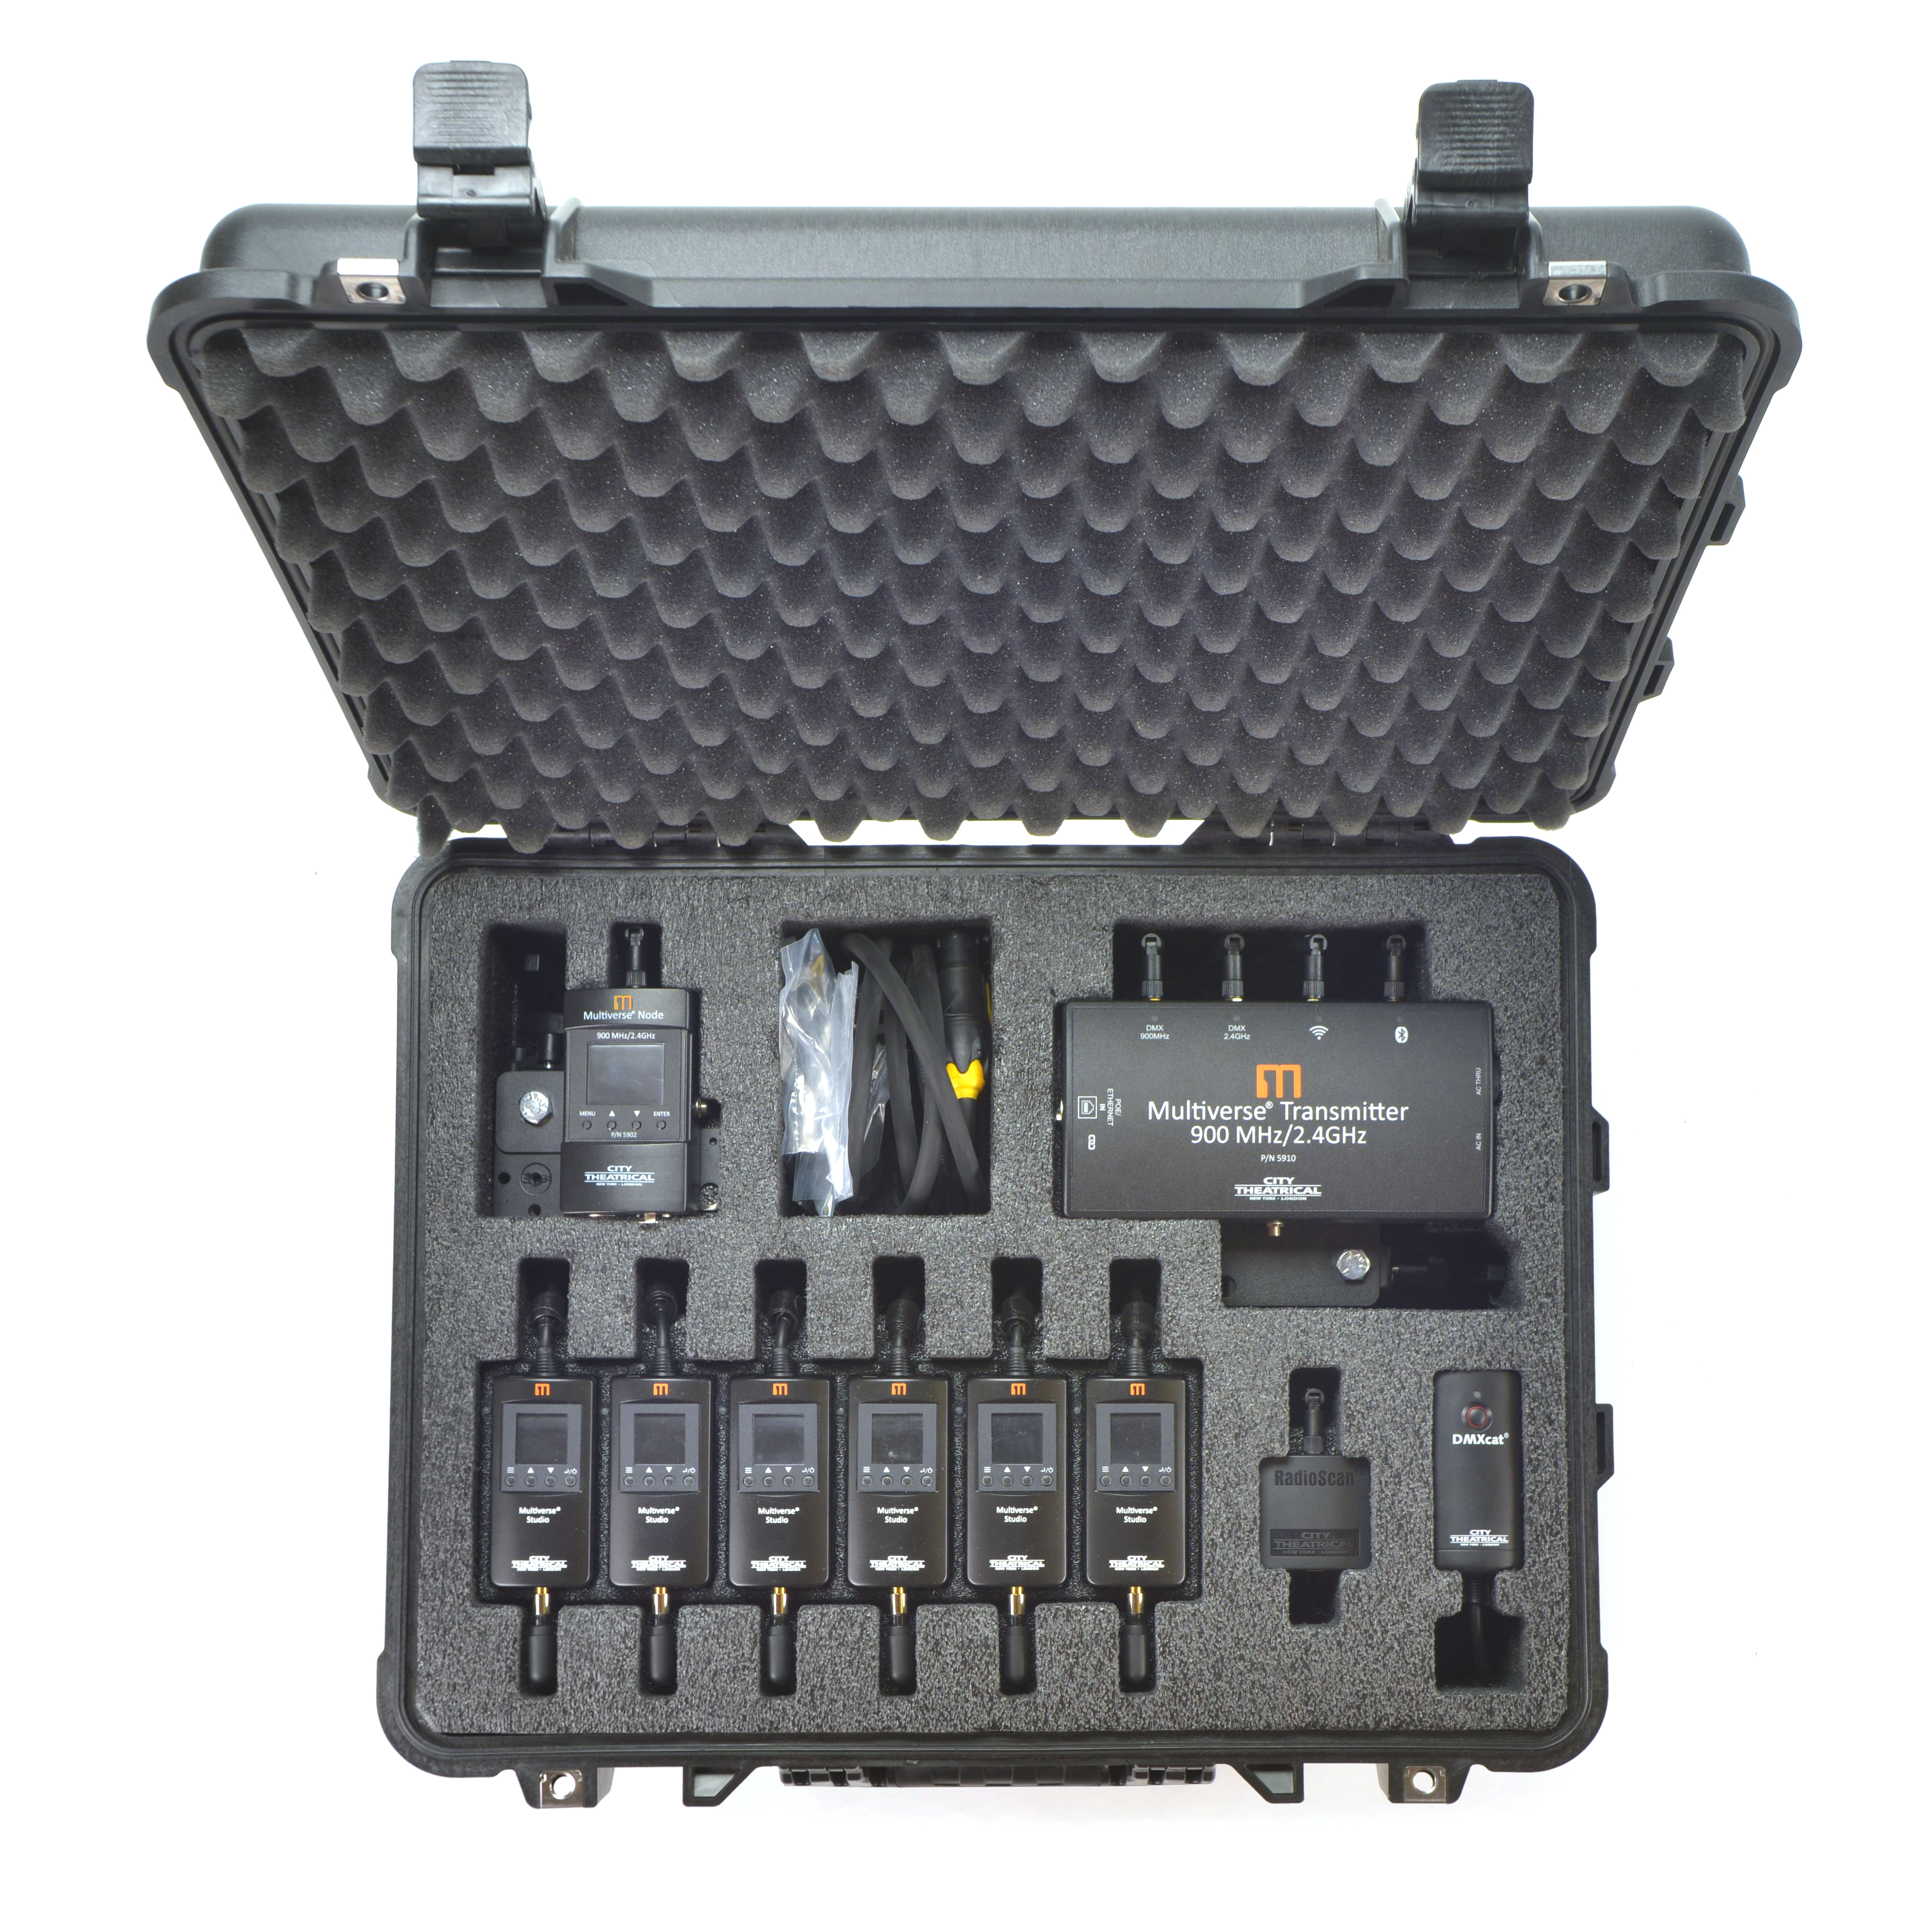 Multiverse Studio Kit 5938